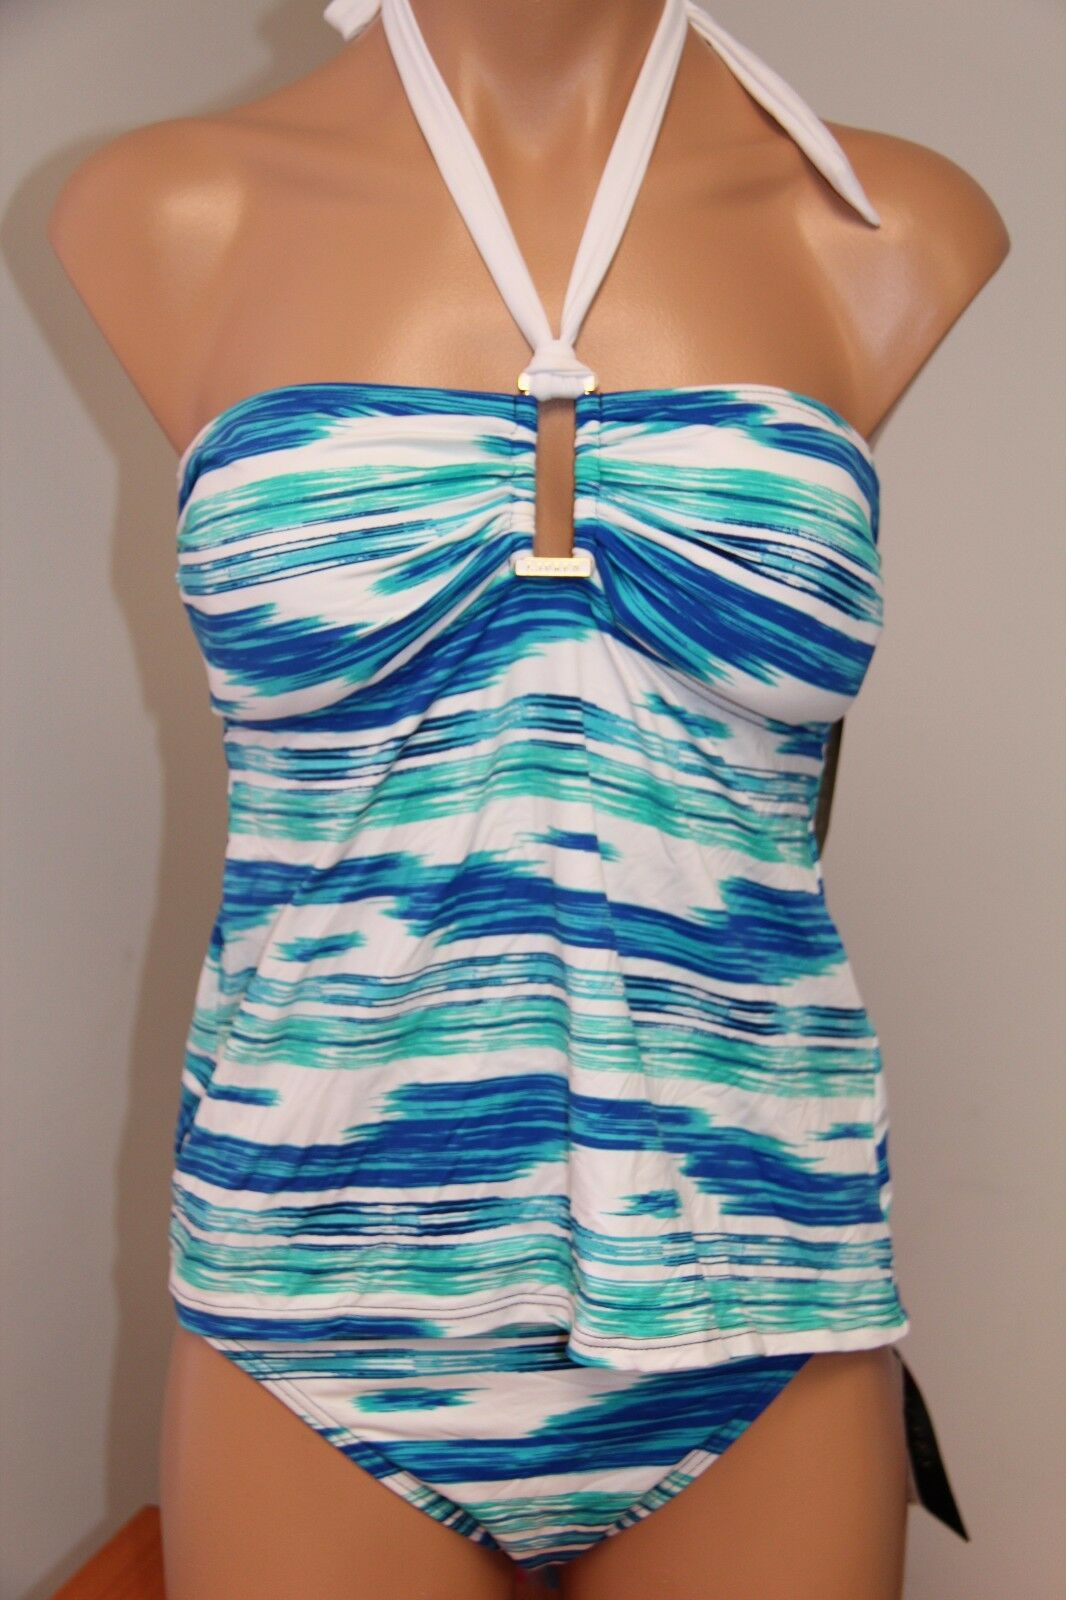 NWT Ralph Lauren Swimwear Bikini  2pc Set Size 8 Tankini Lag Classic